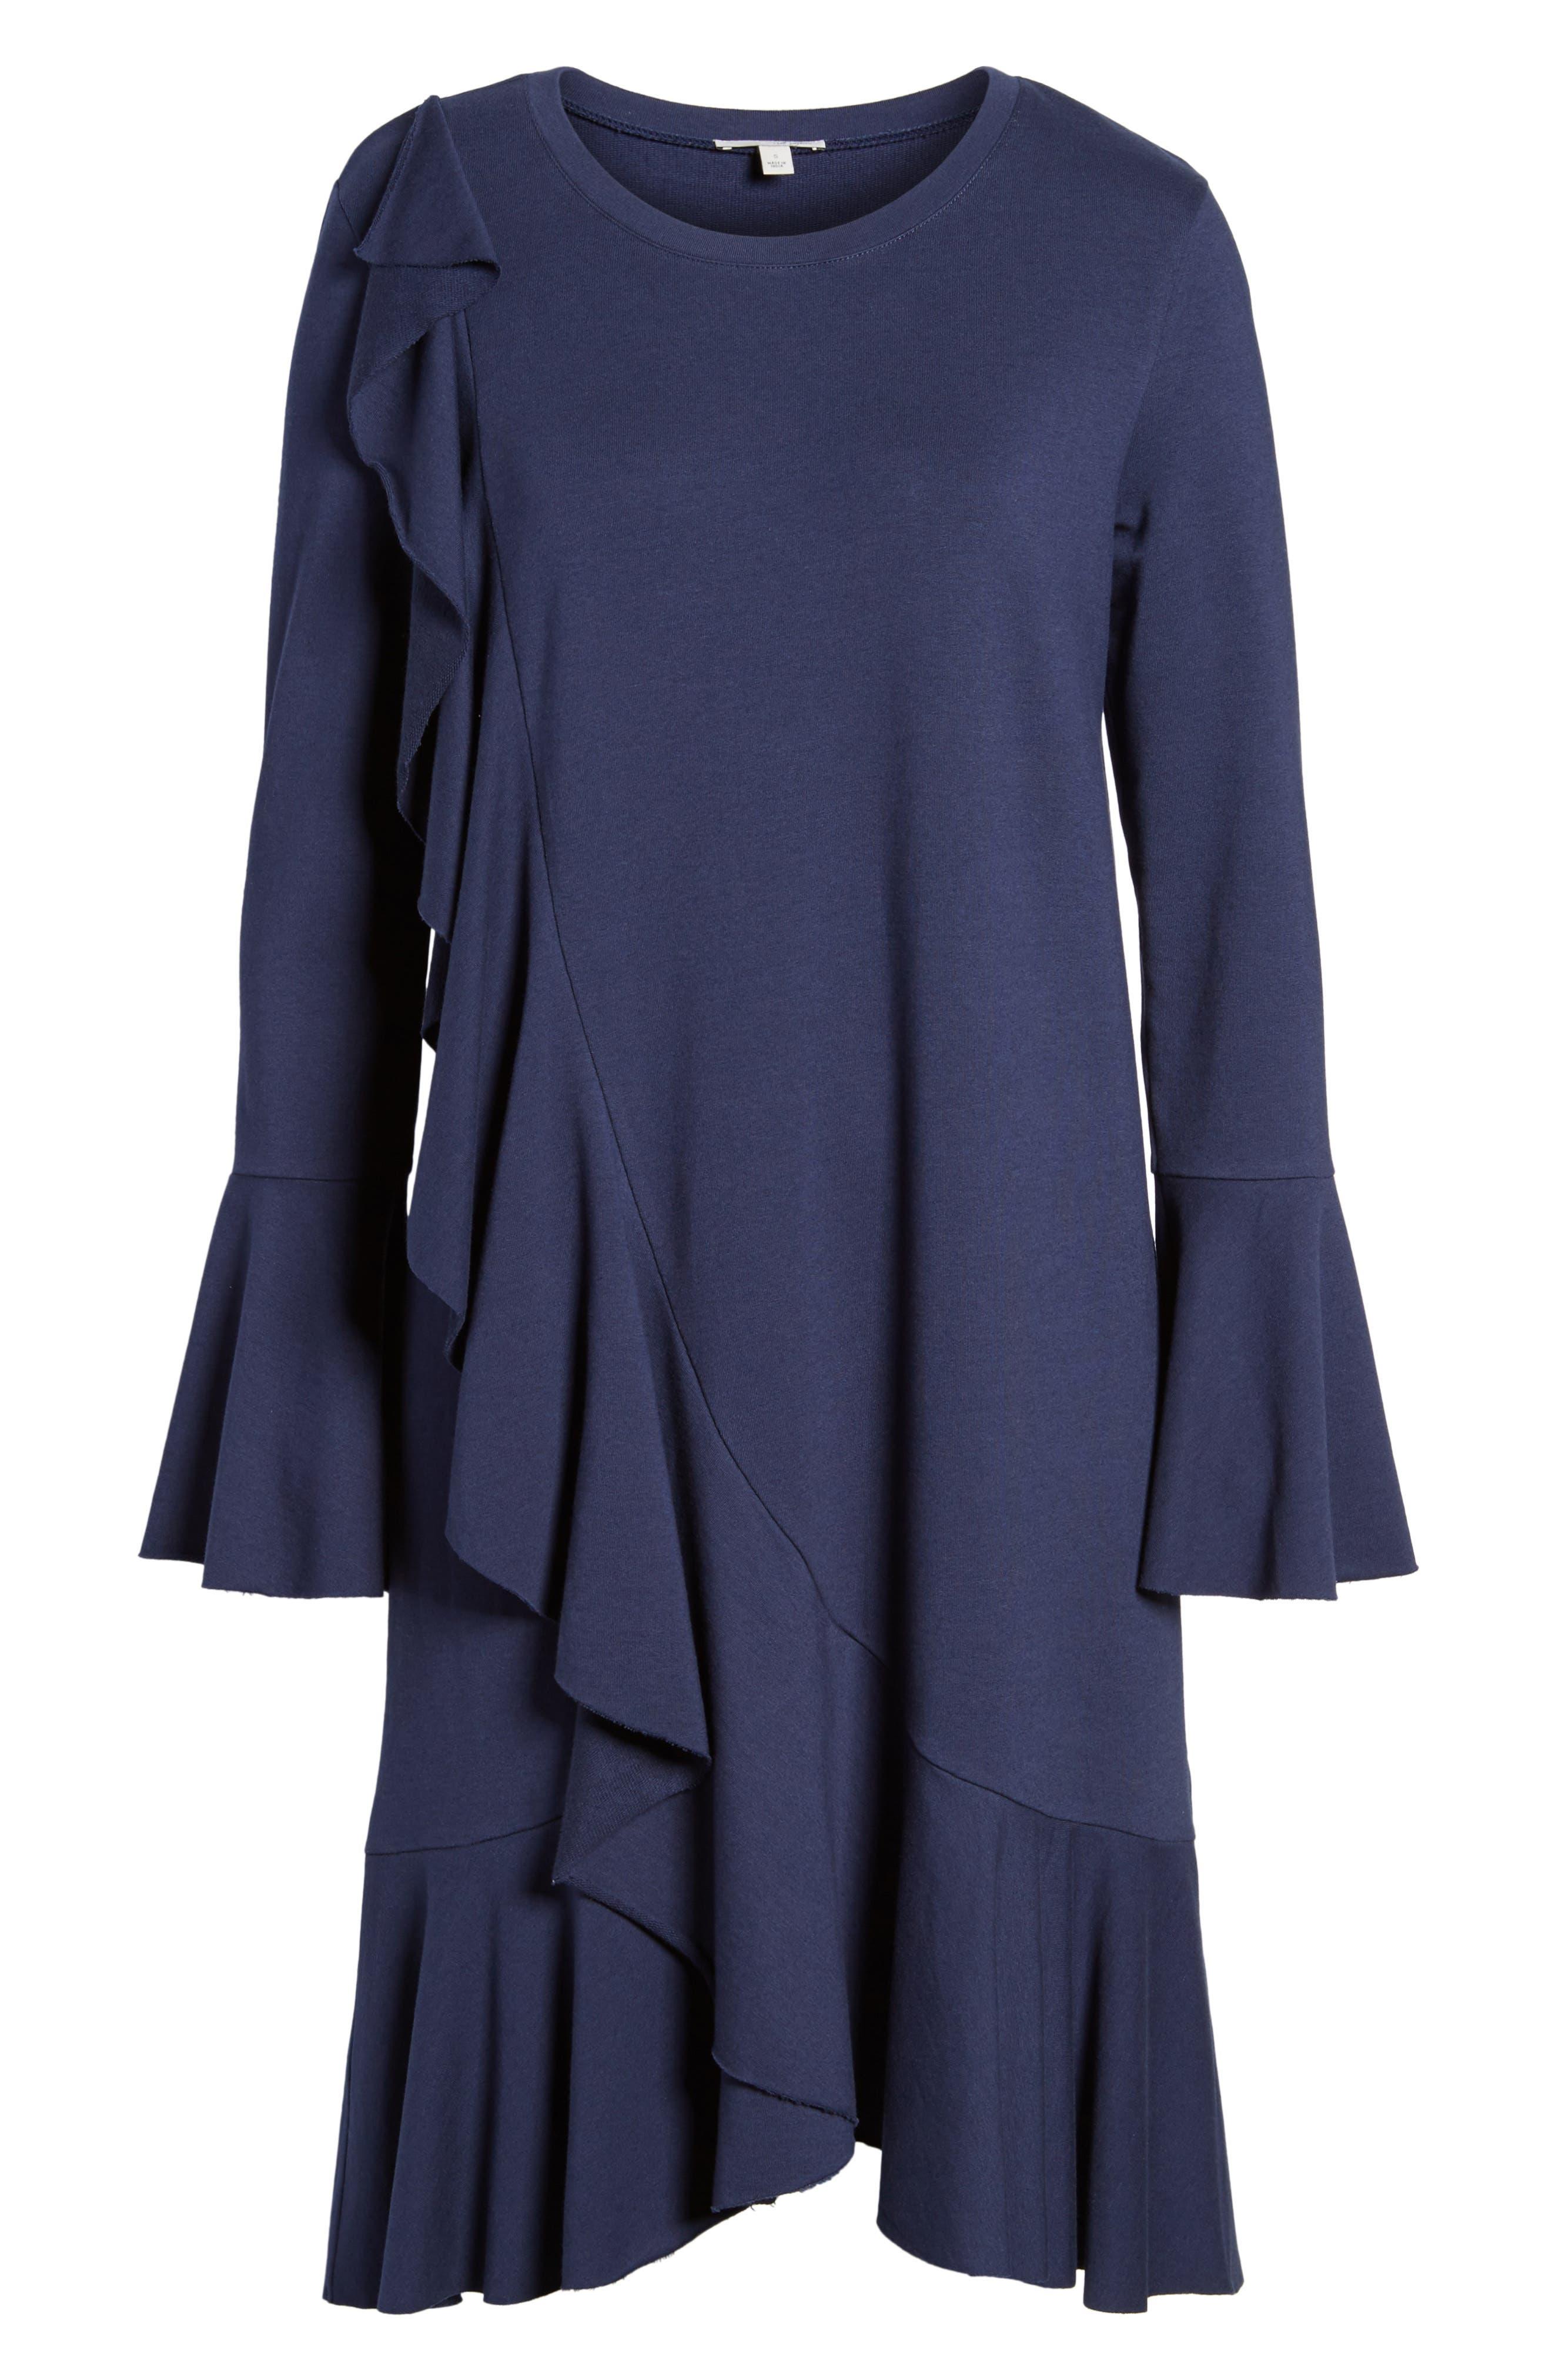 Ruffle Detail Knit Dress,                             Alternate thumbnail 18, color,